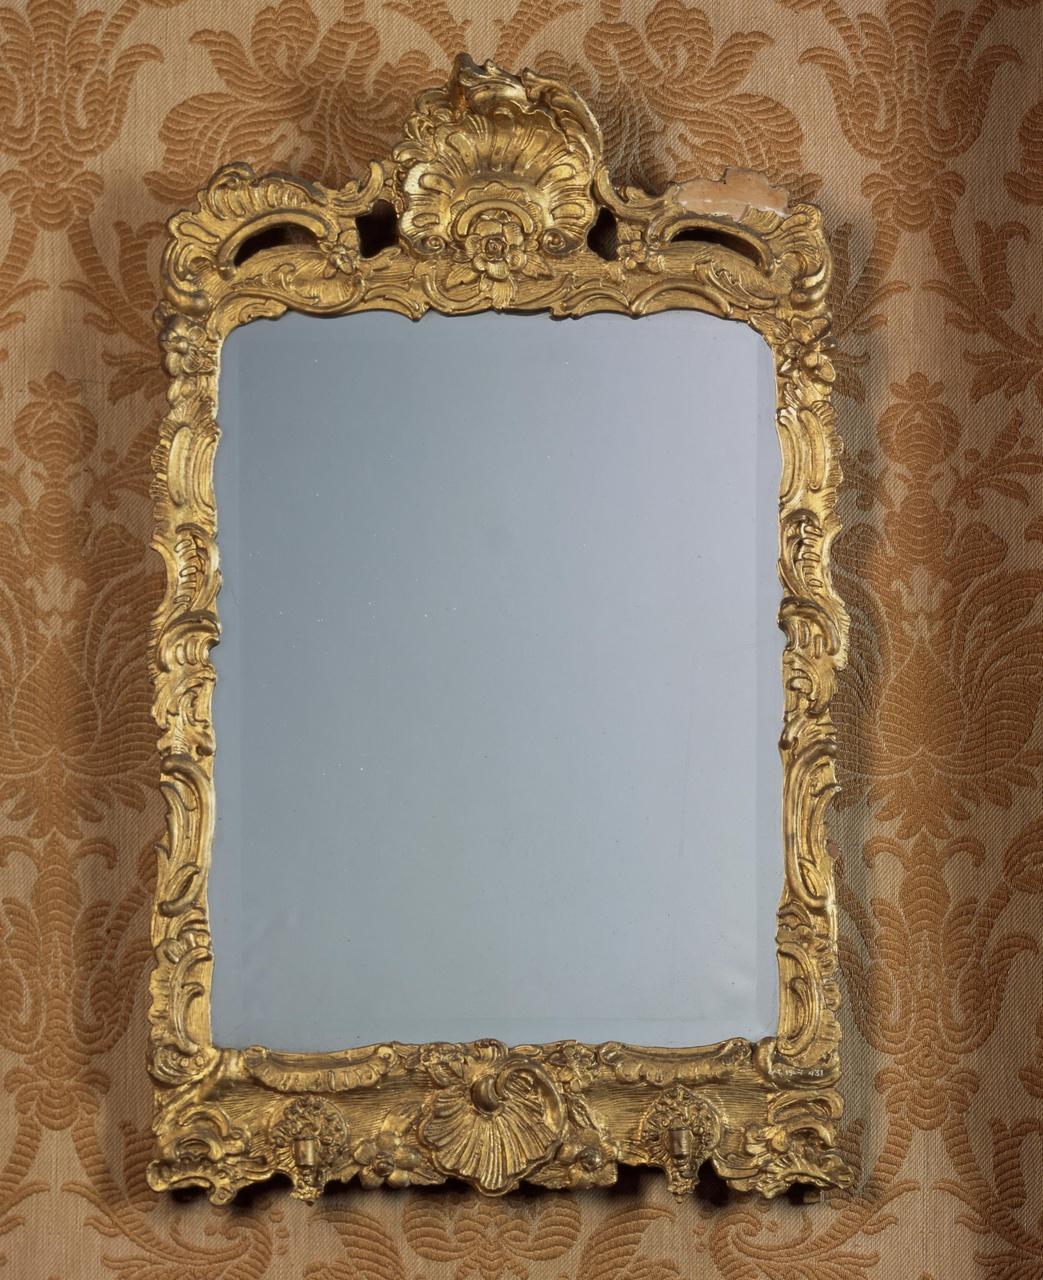 Twee spiegels